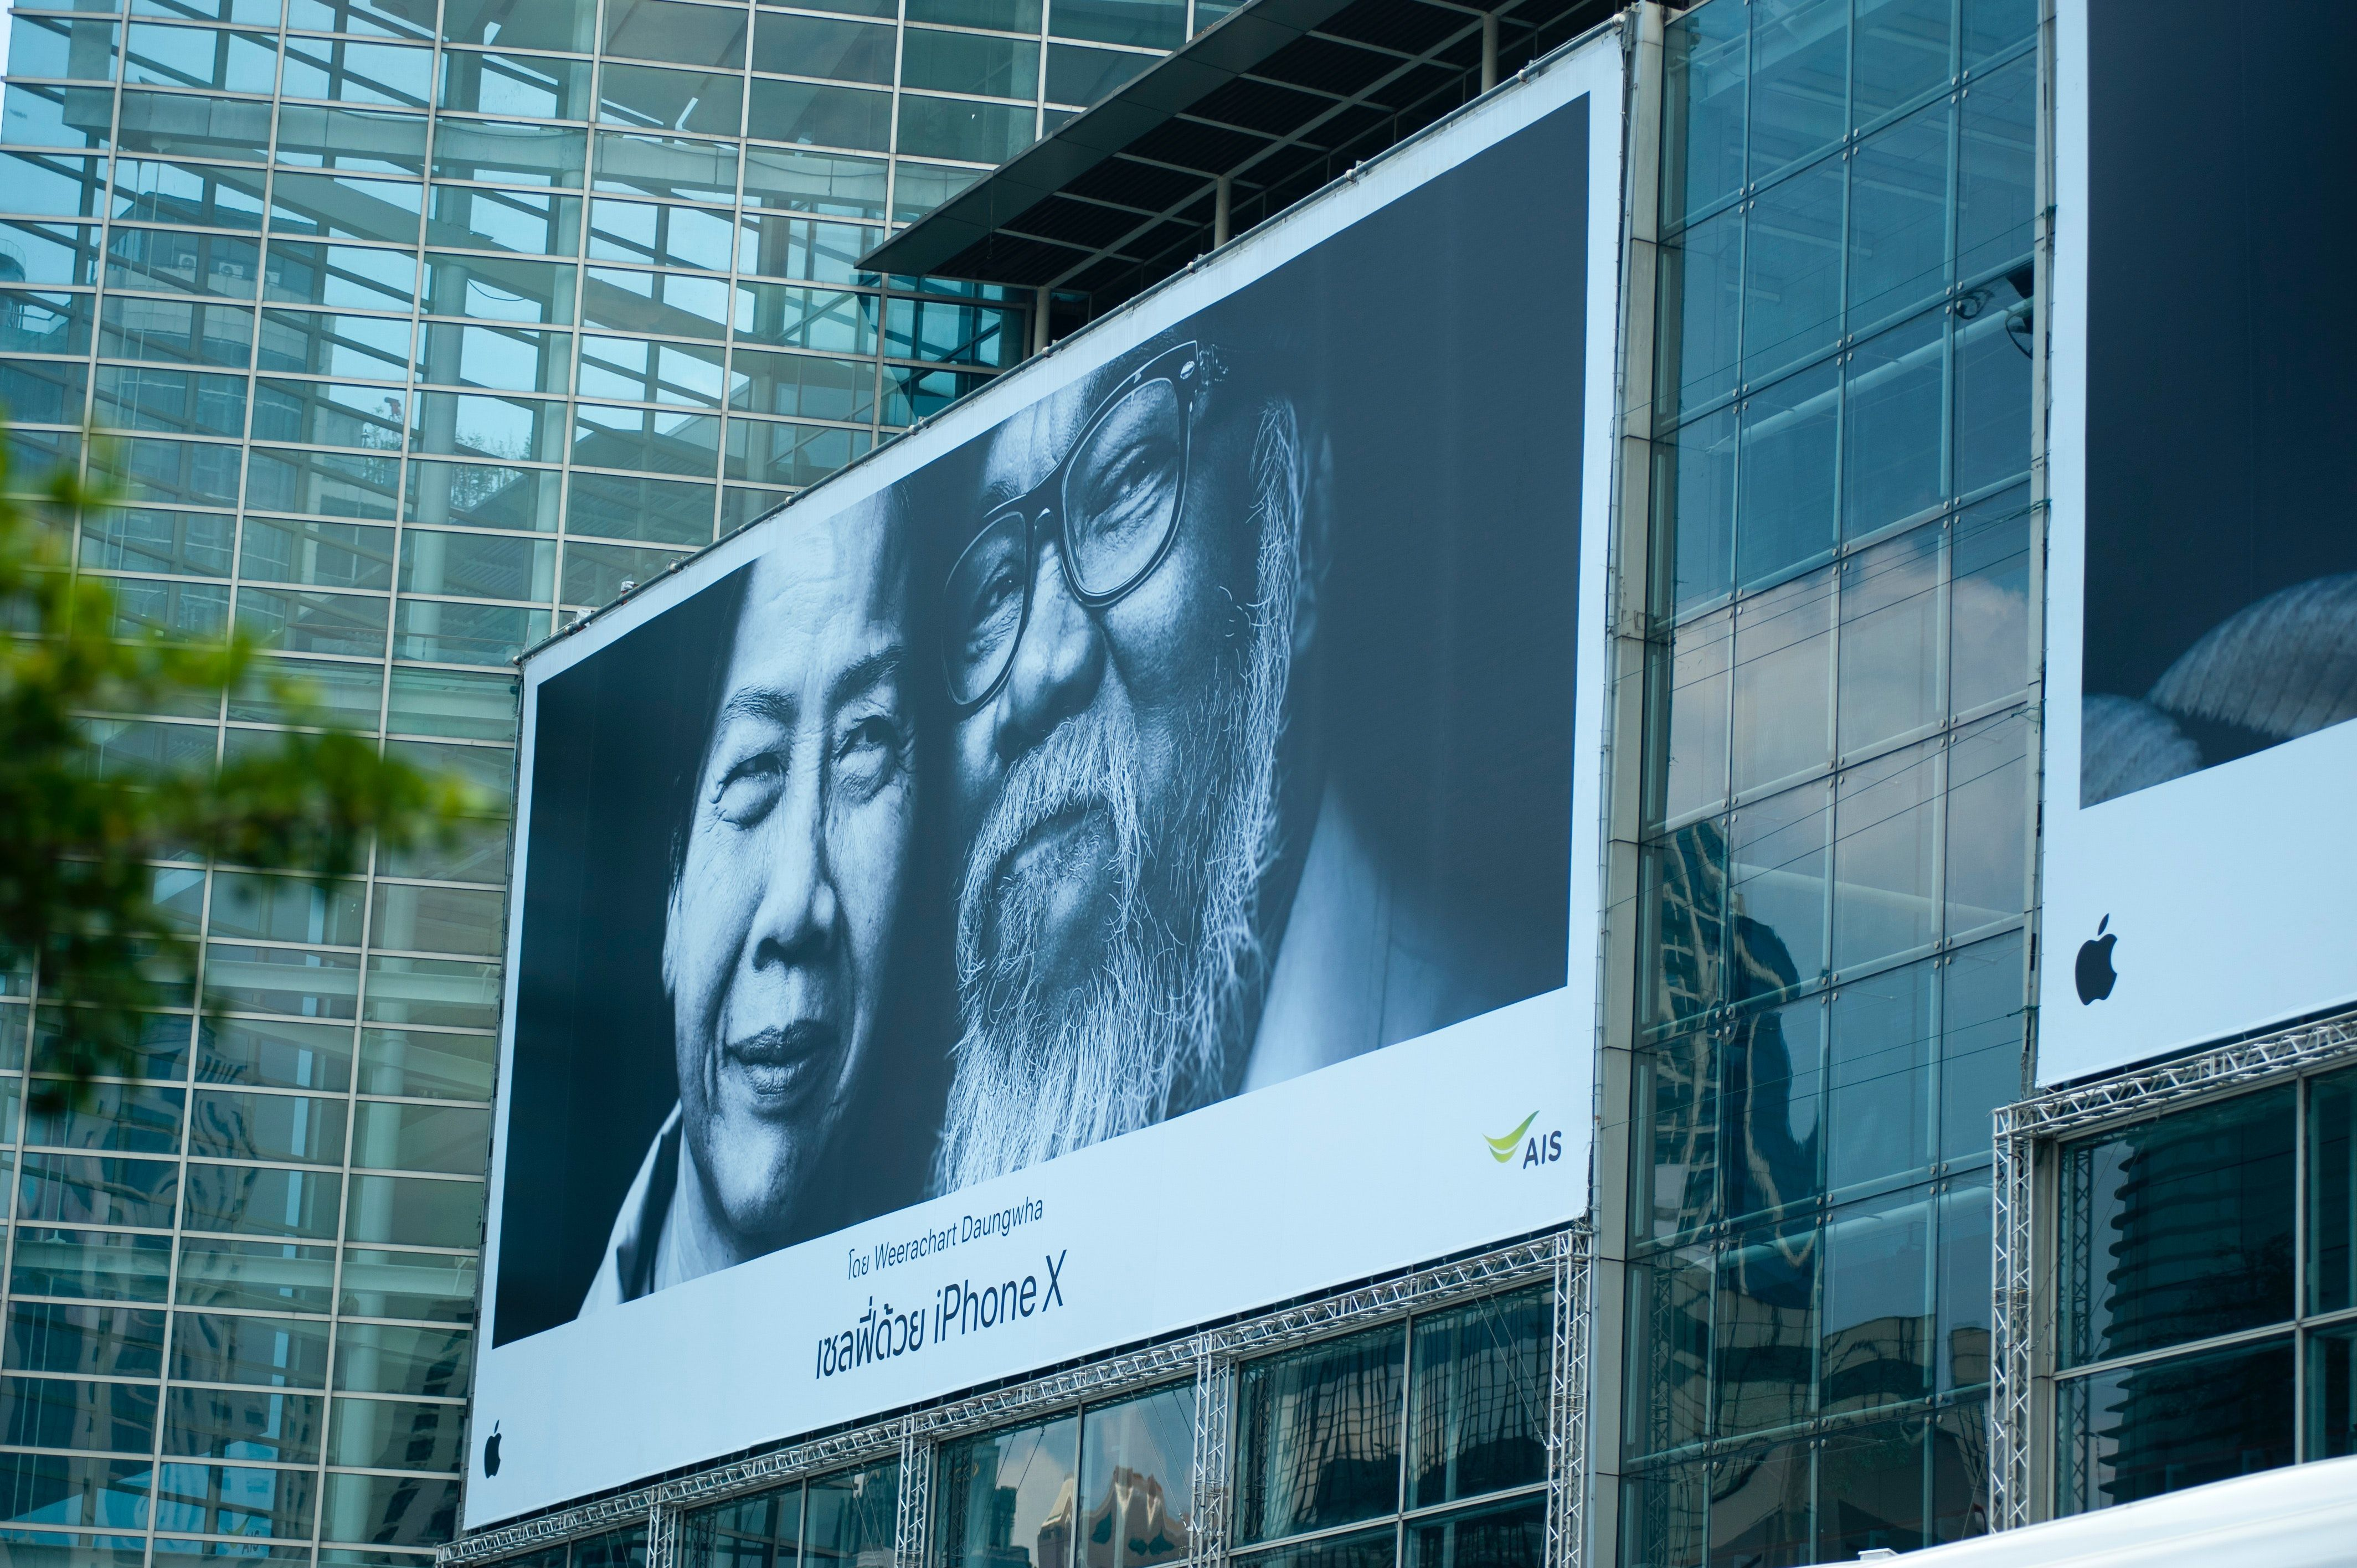 Image result for nyc building billboard billboard